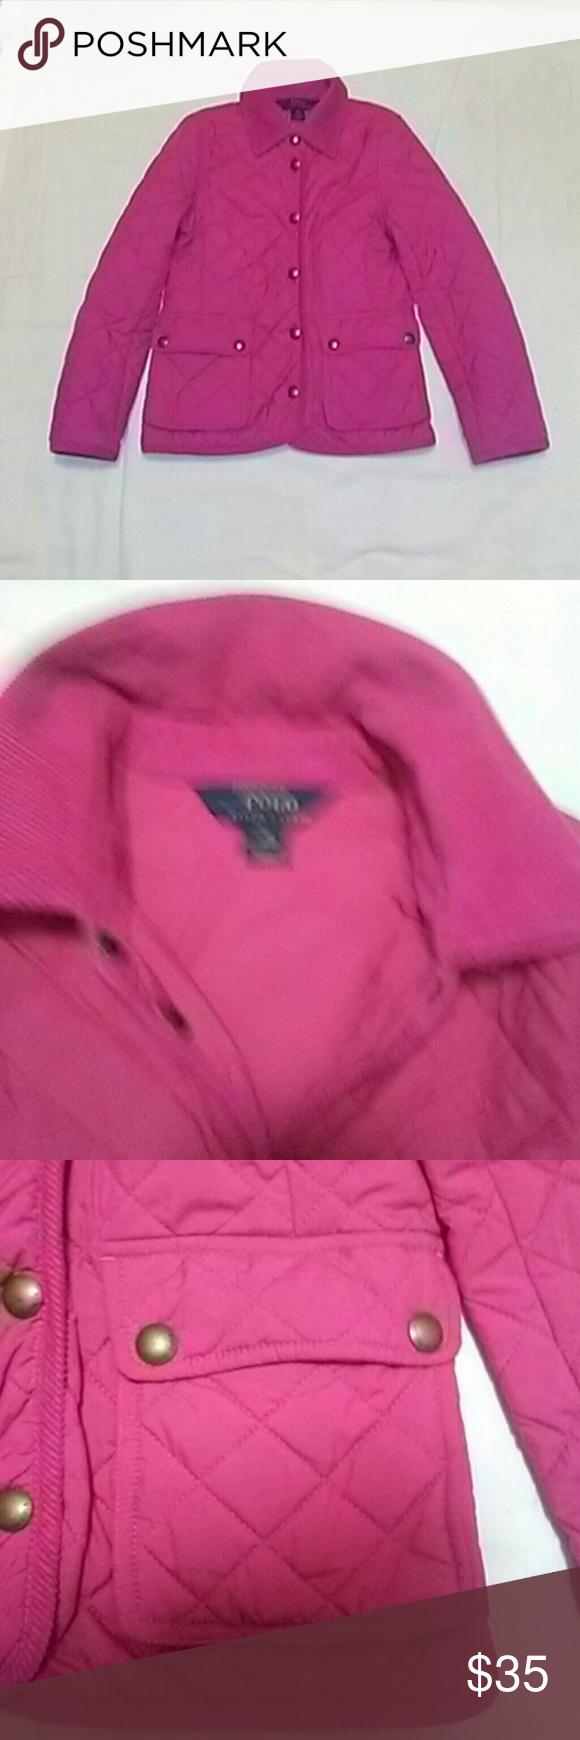 9da0c404c Polo Ralph Lauren Girl quilted jacket. Size 8-10